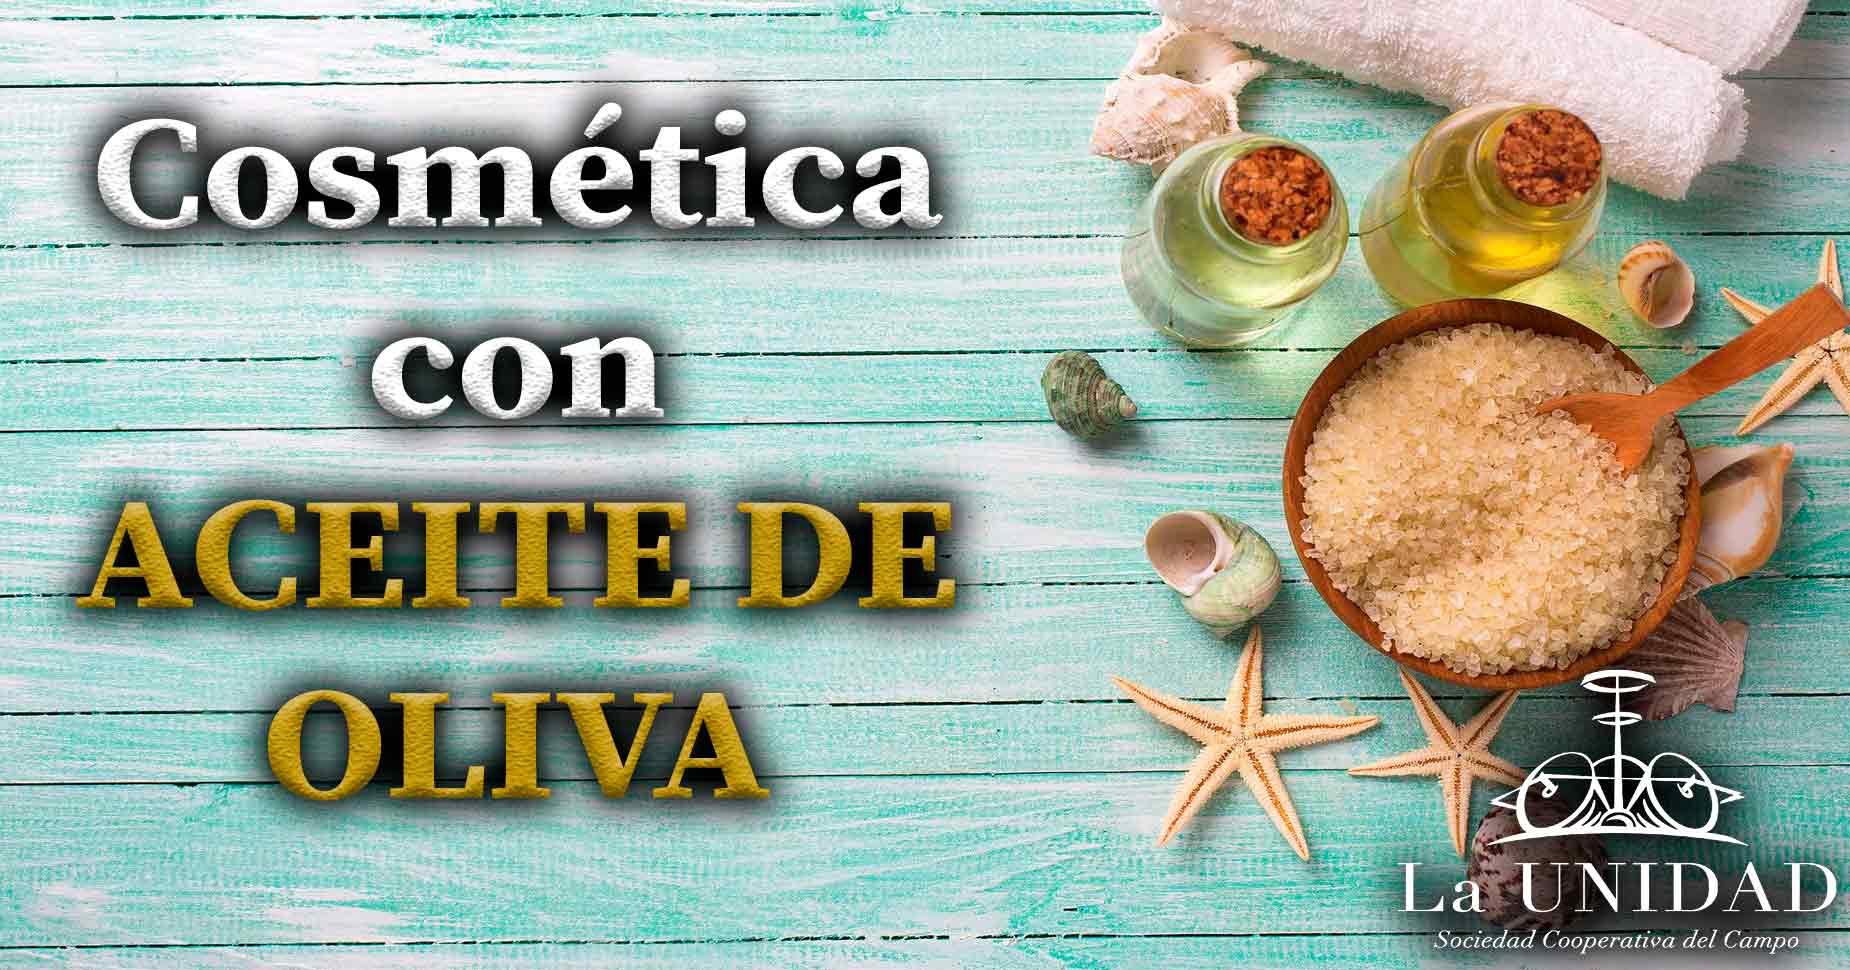 cosmetica con aceite de oliva